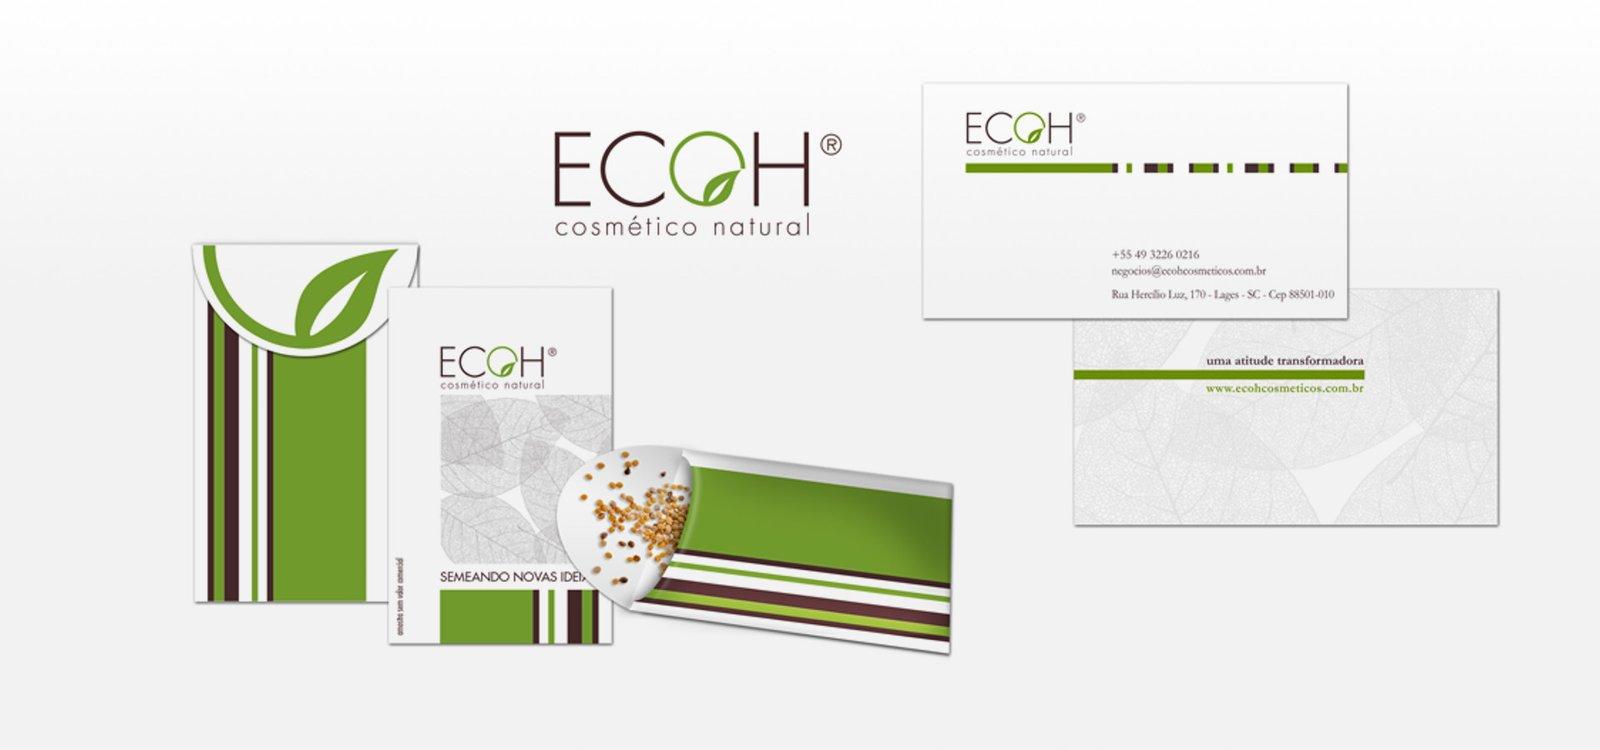 ecoh-4